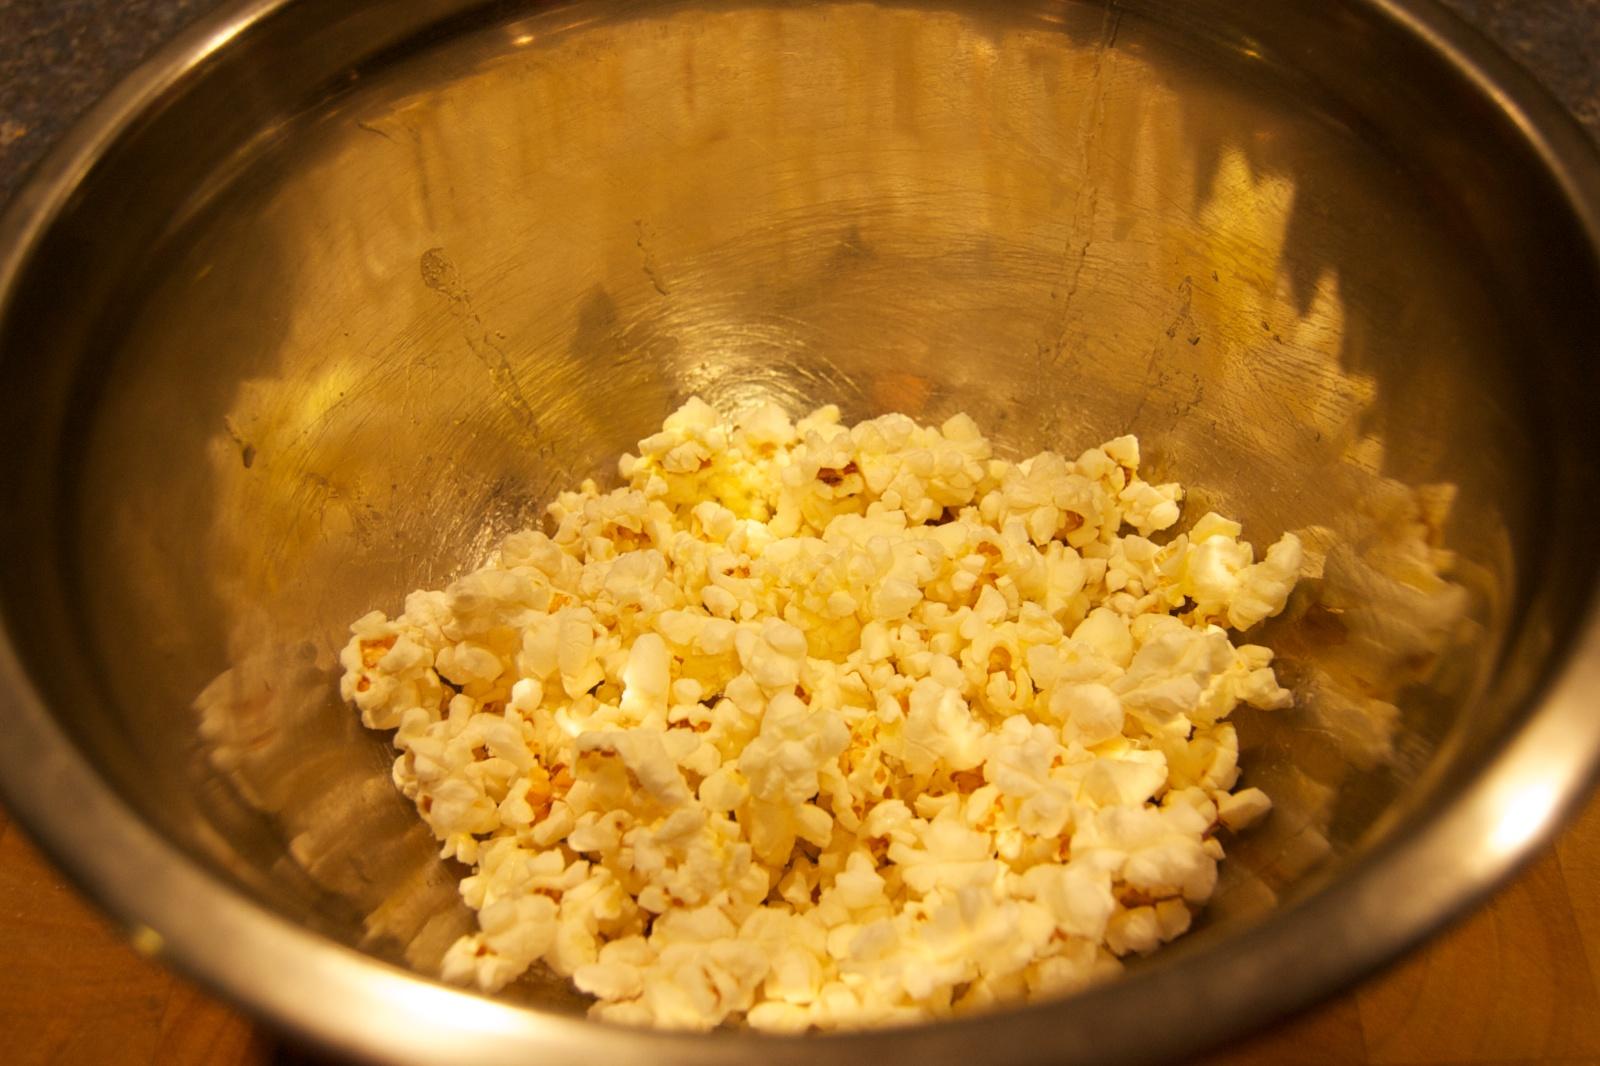 http://blog.rickk.com/food/2013/12/14/ate.2013.12.14.s2.jpg